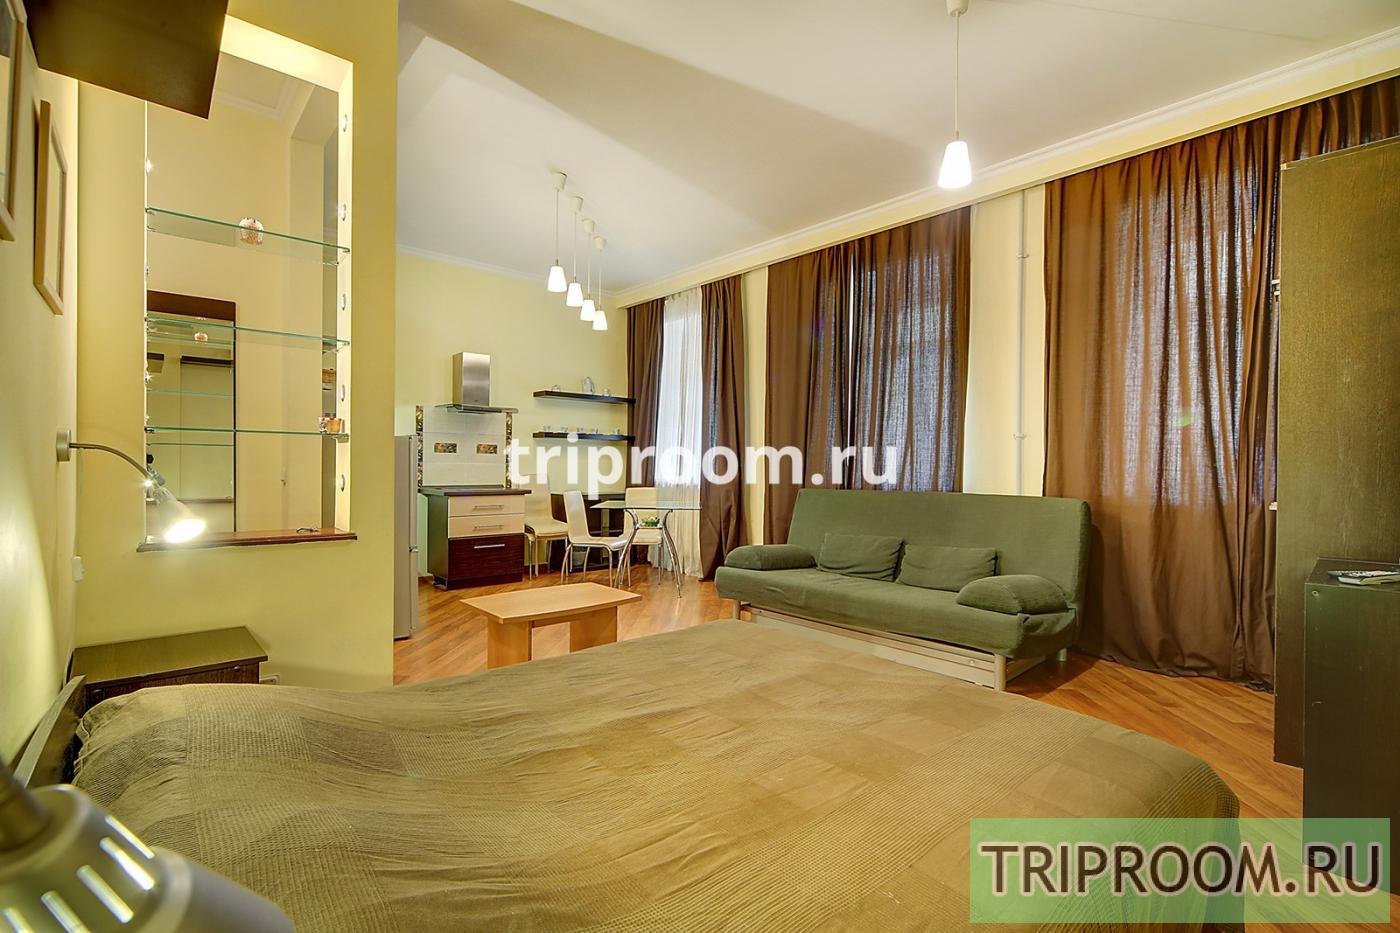 1-комнатная квартира посуточно (вариант № 15117), ул. Канала Грибоедова набережная, фото № 4